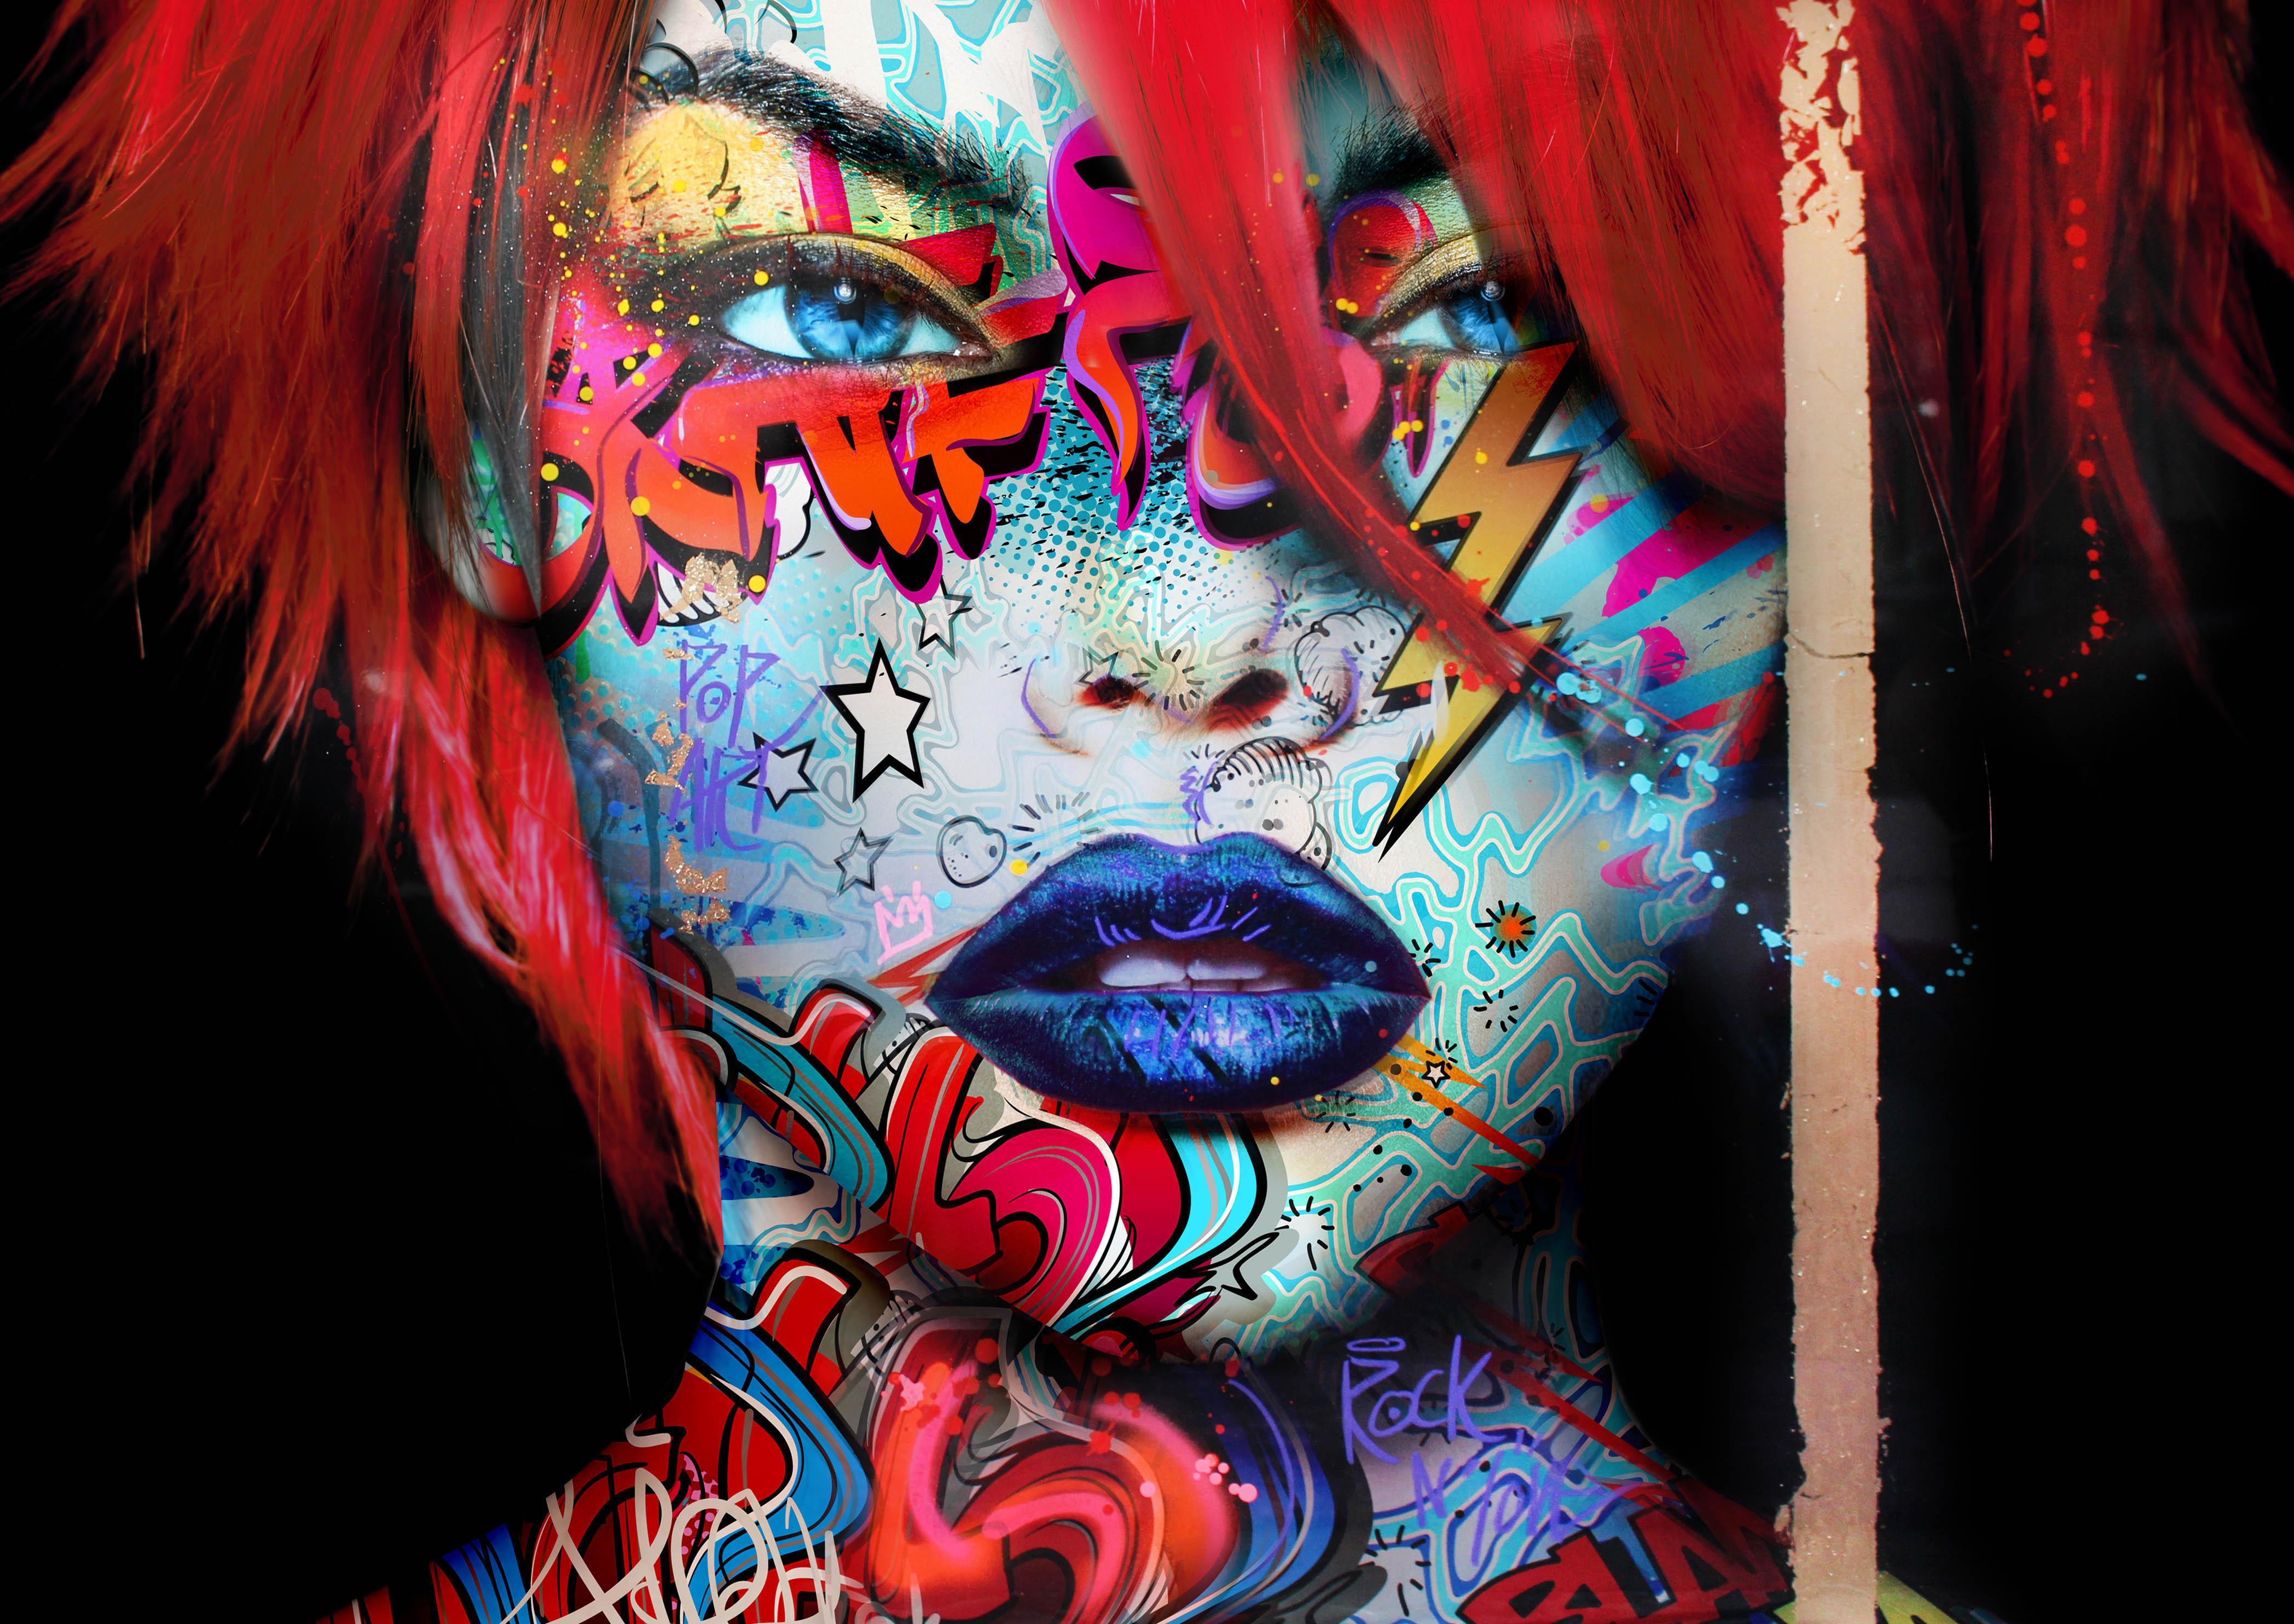 """Red Carmilla"" -- Pop art, pop culture, feminism, woman power, woman empowerment"